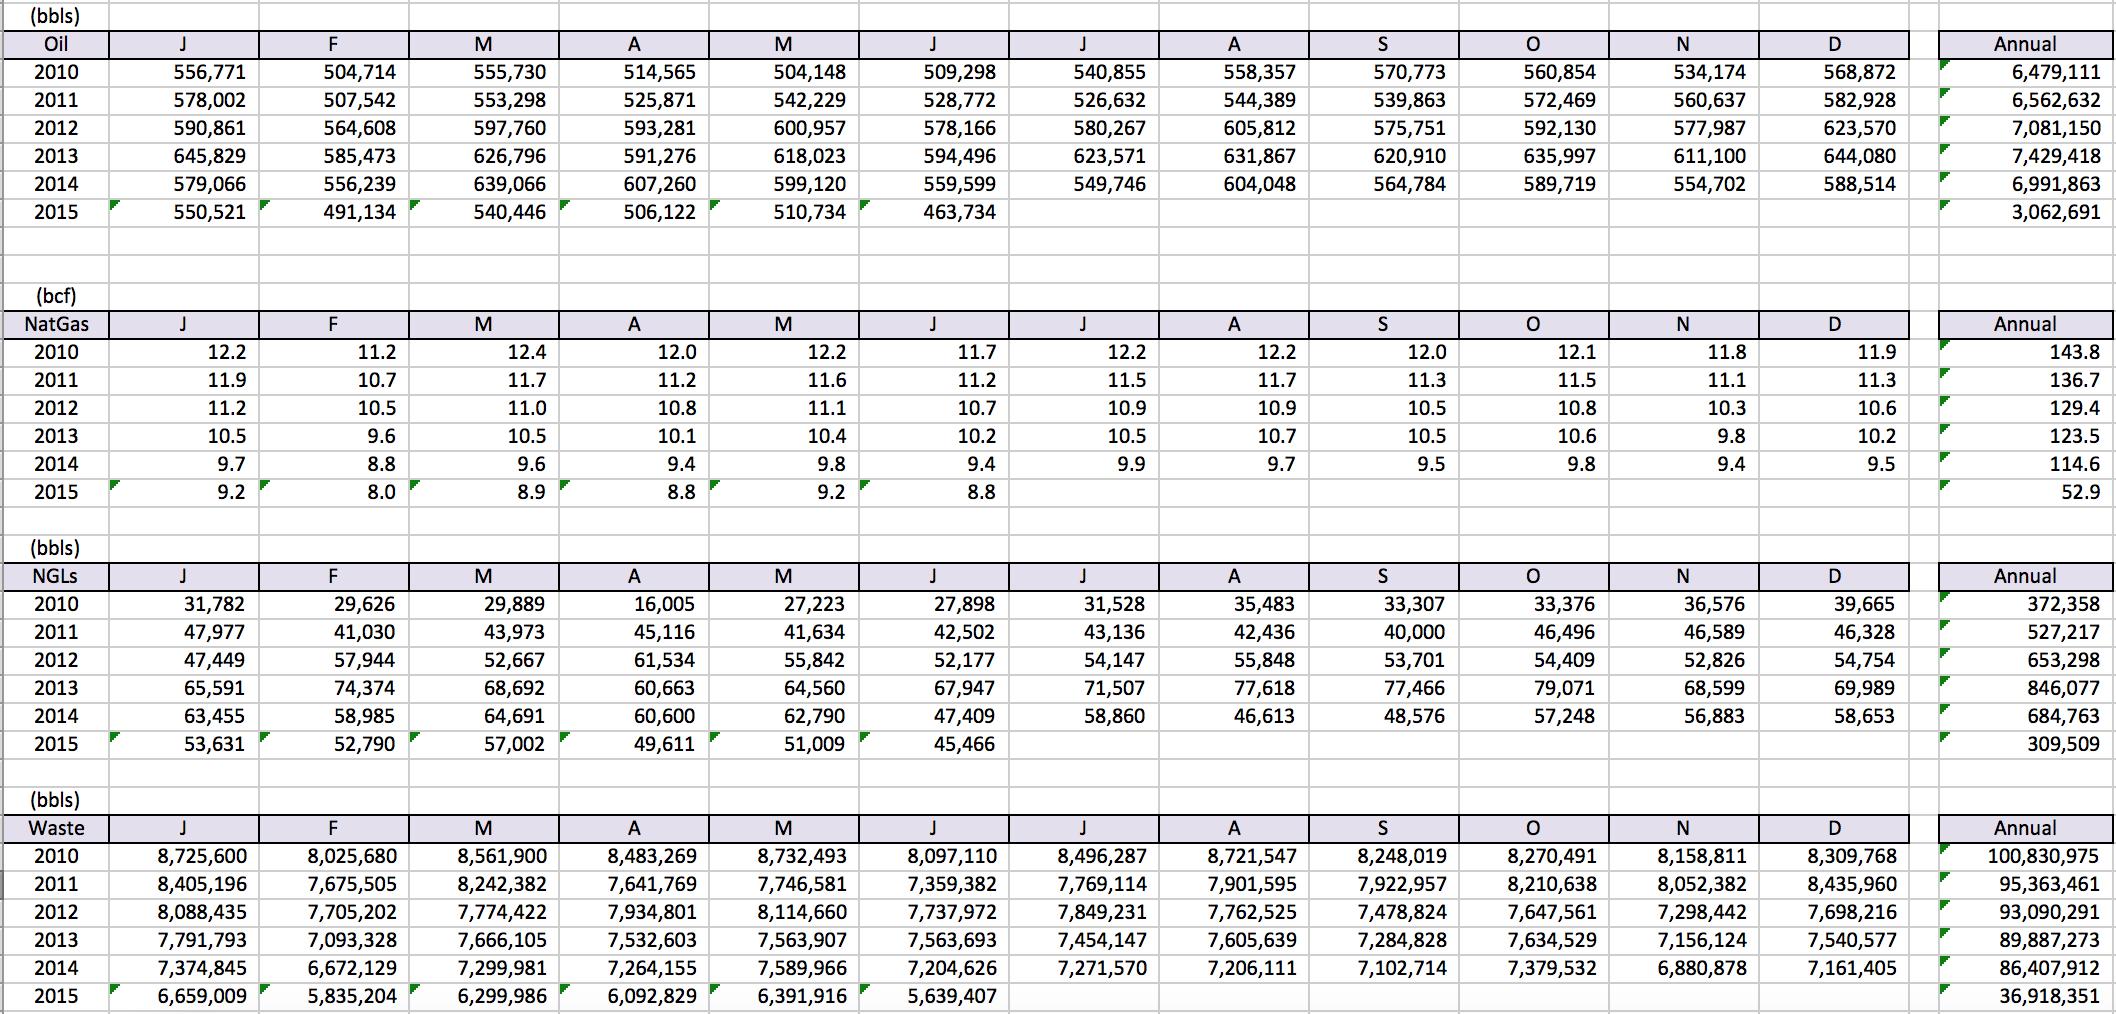 Michigan Oil Production Data